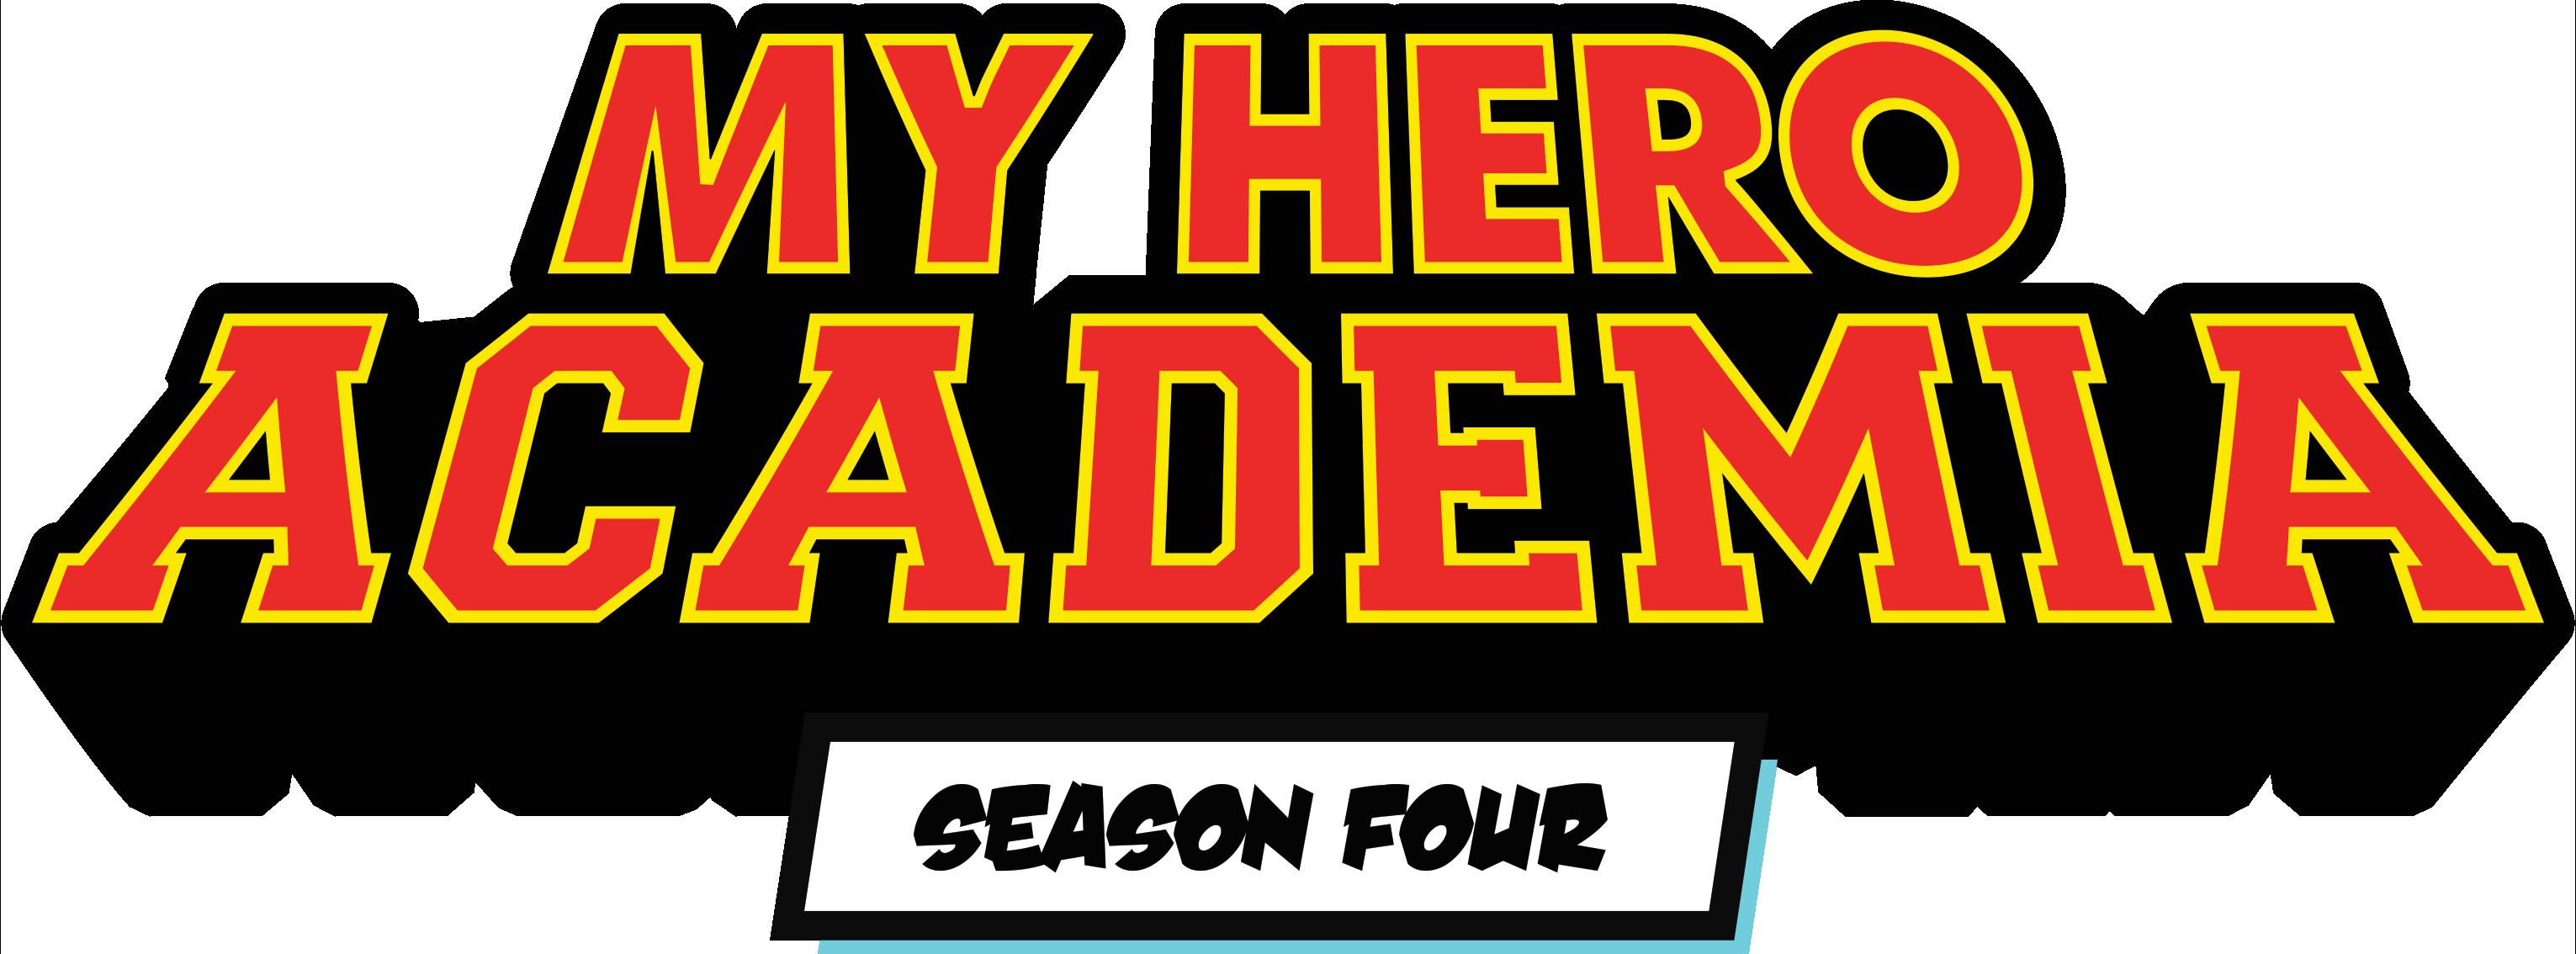 My Hero Academia Season 4 Logo.